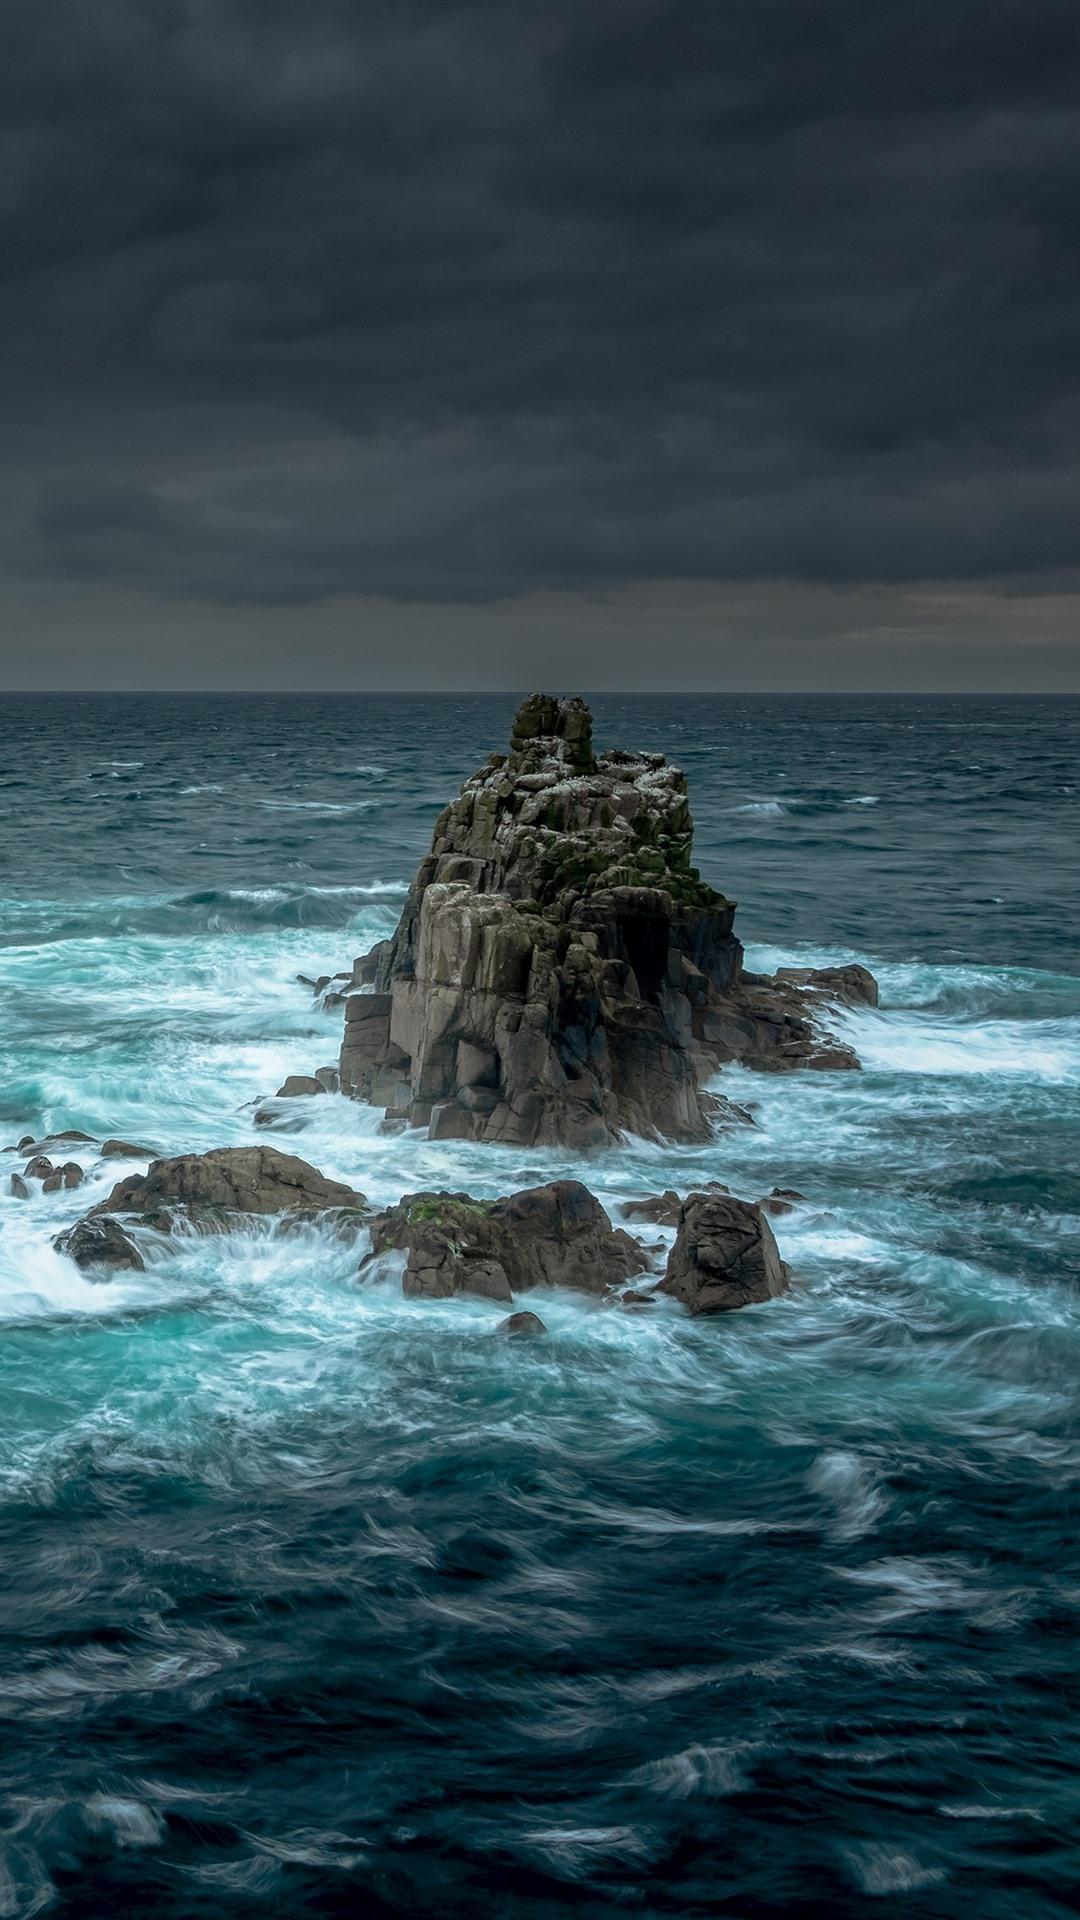 Rocks sea storm clouds 1080x1920 iPhone 8766S Plus wallpaper 1080x1920